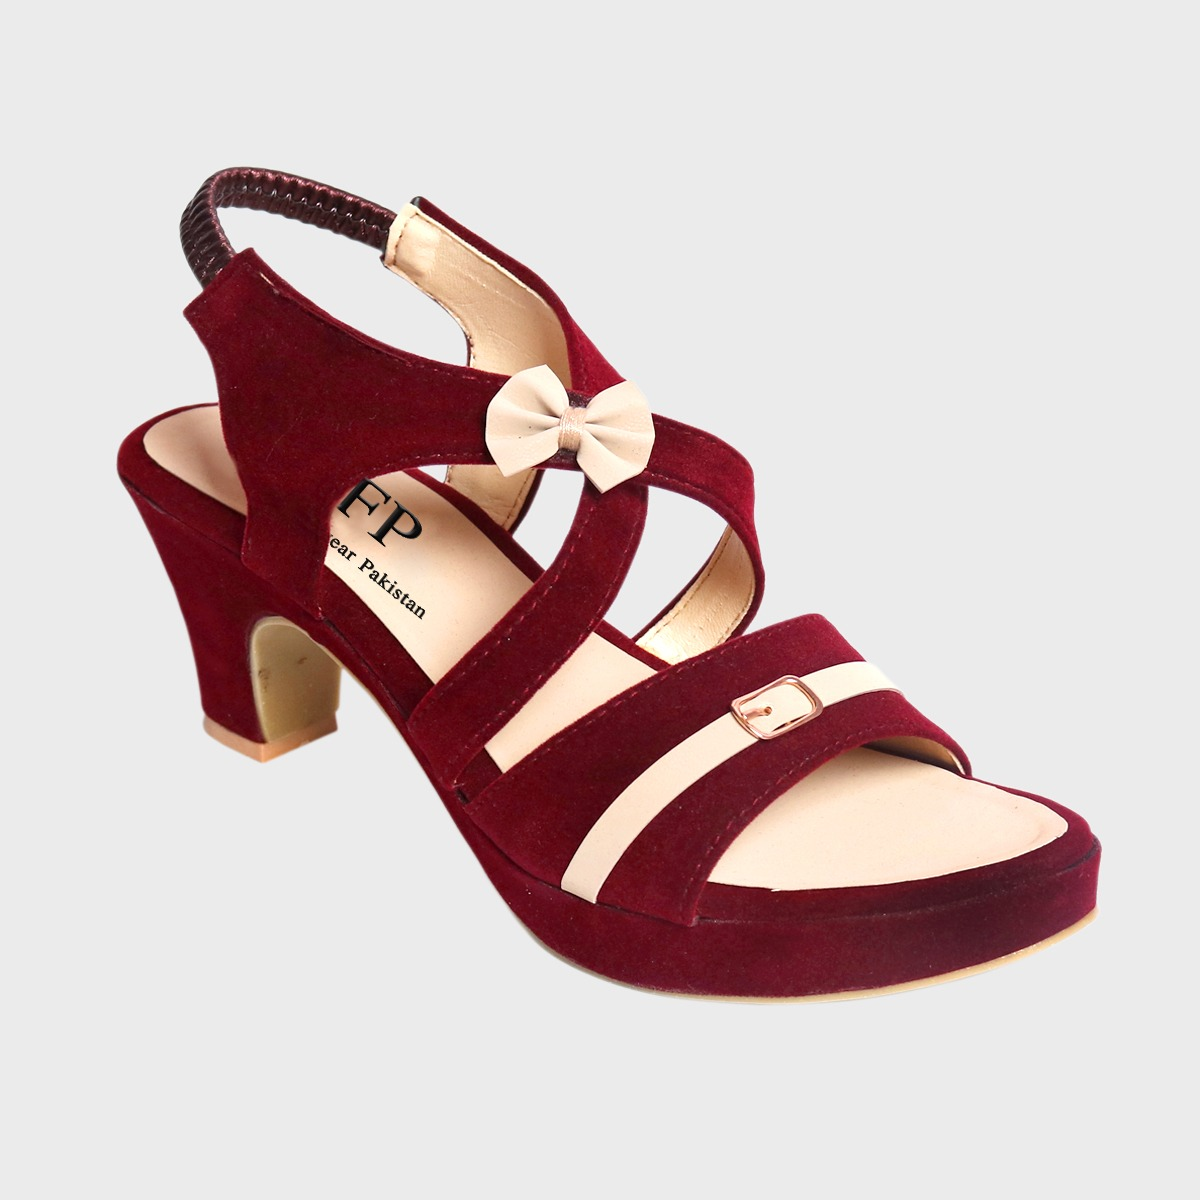 New Stylish Heels Sandal for Women